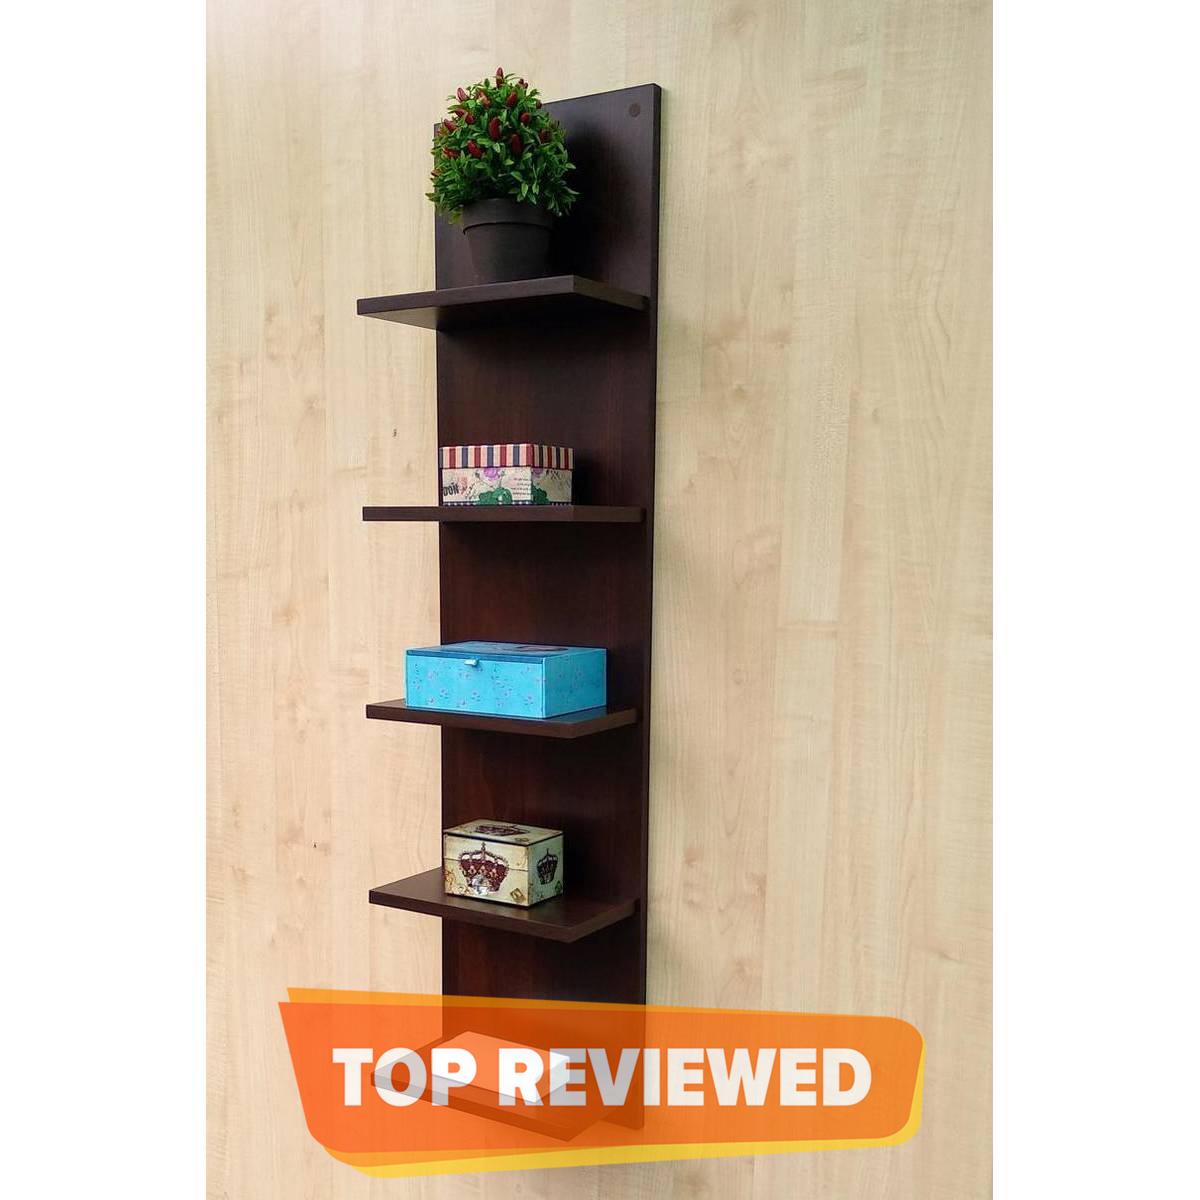 An Adorable Wall Mounted Wooden Shelves - Floating Shelves - Storage Racks